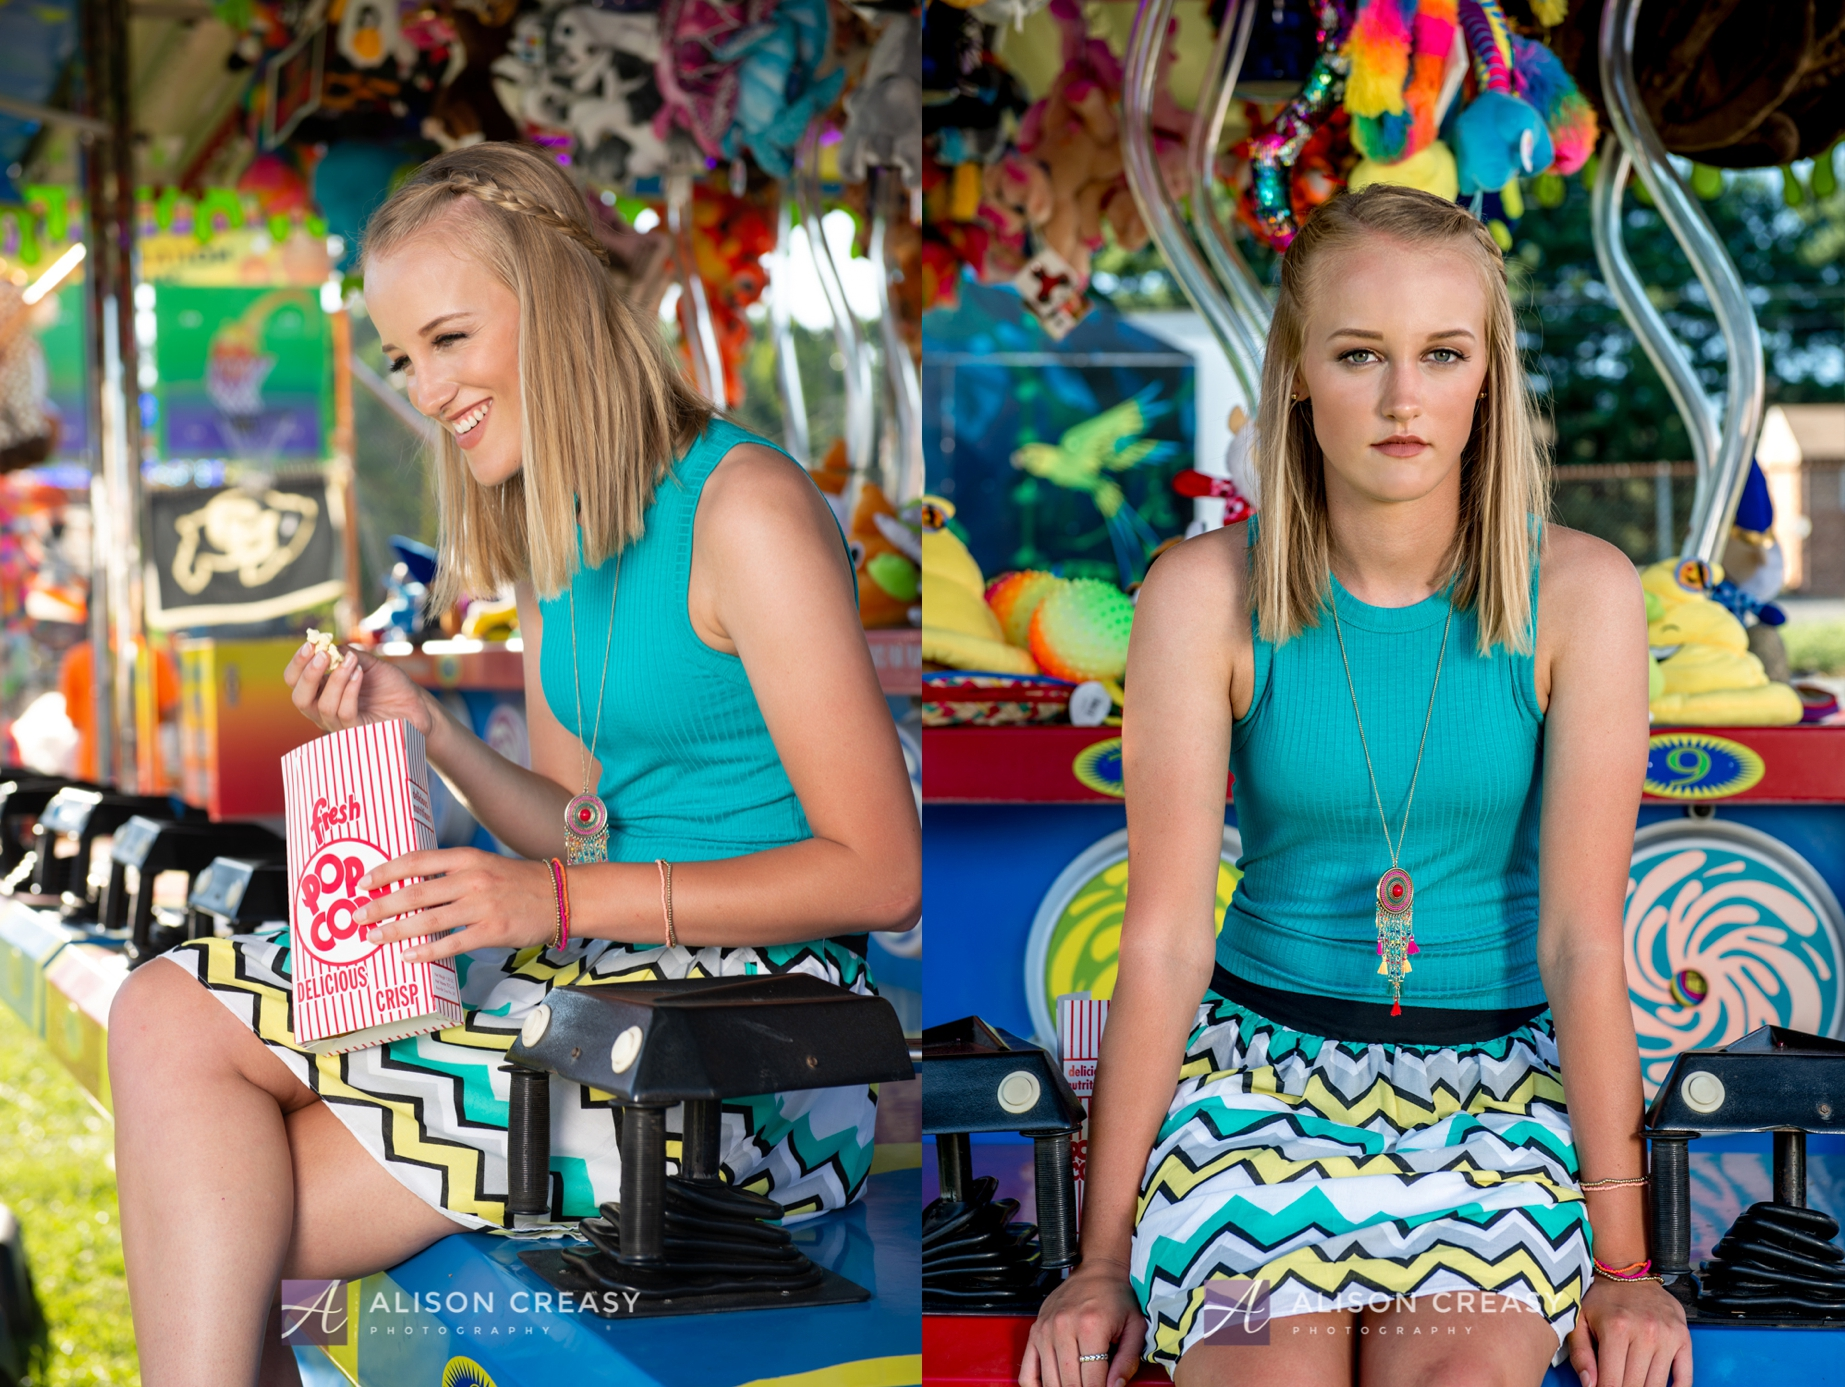 Alison-Creasy-Photography-Lynchburg-VA-Senior- Photographer_0019.jpg